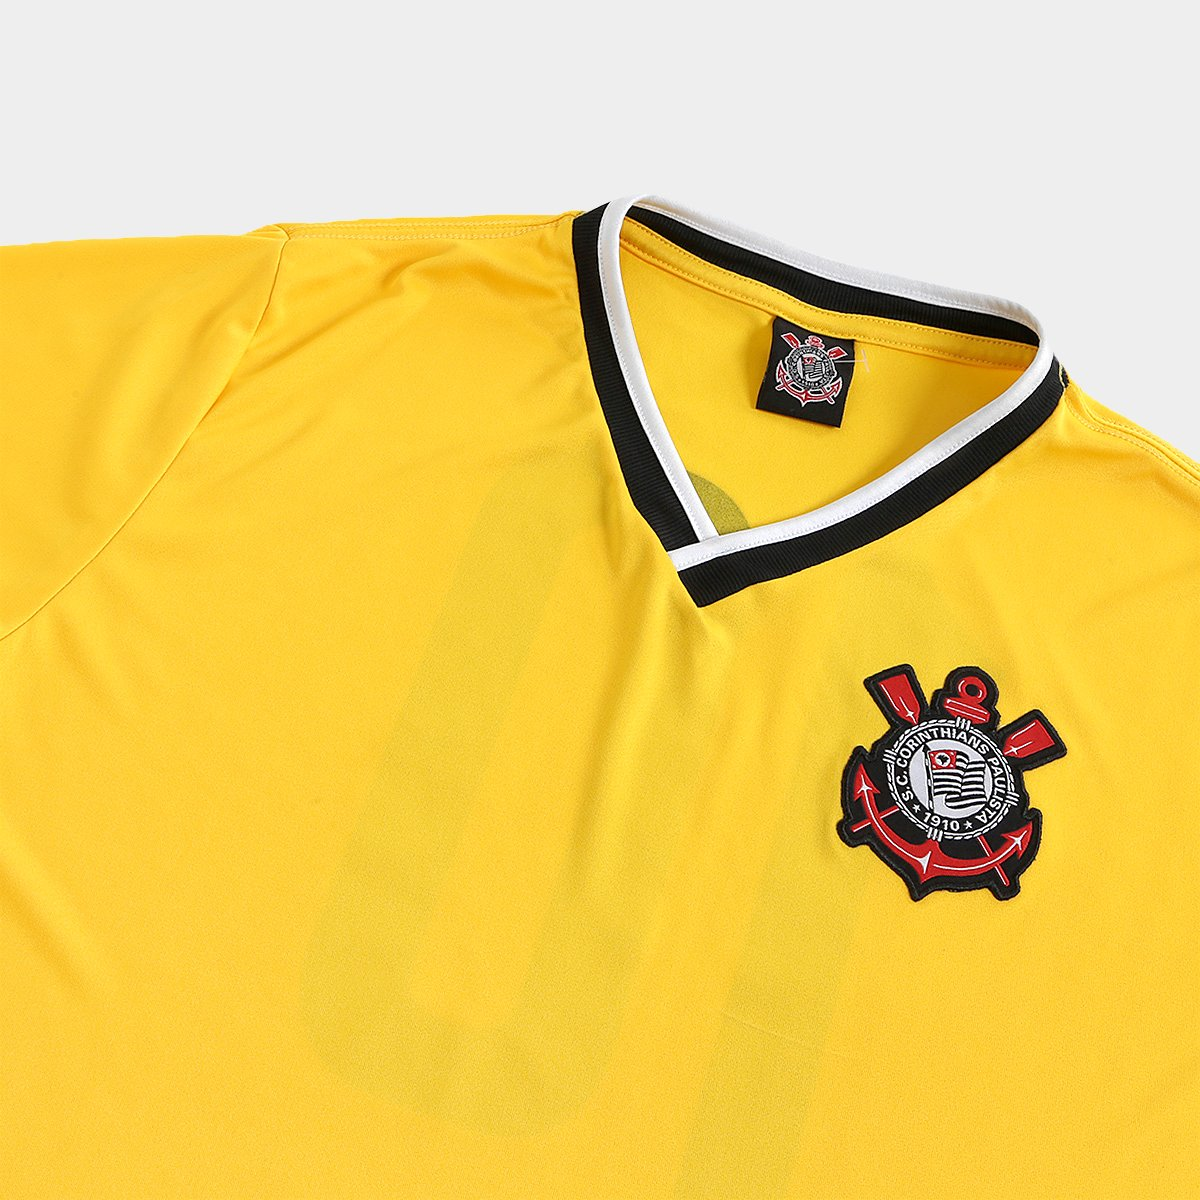 27c838506d Camisa Corinthians 2014 n° 10 Edição limitada Masculina - Amarelo ...